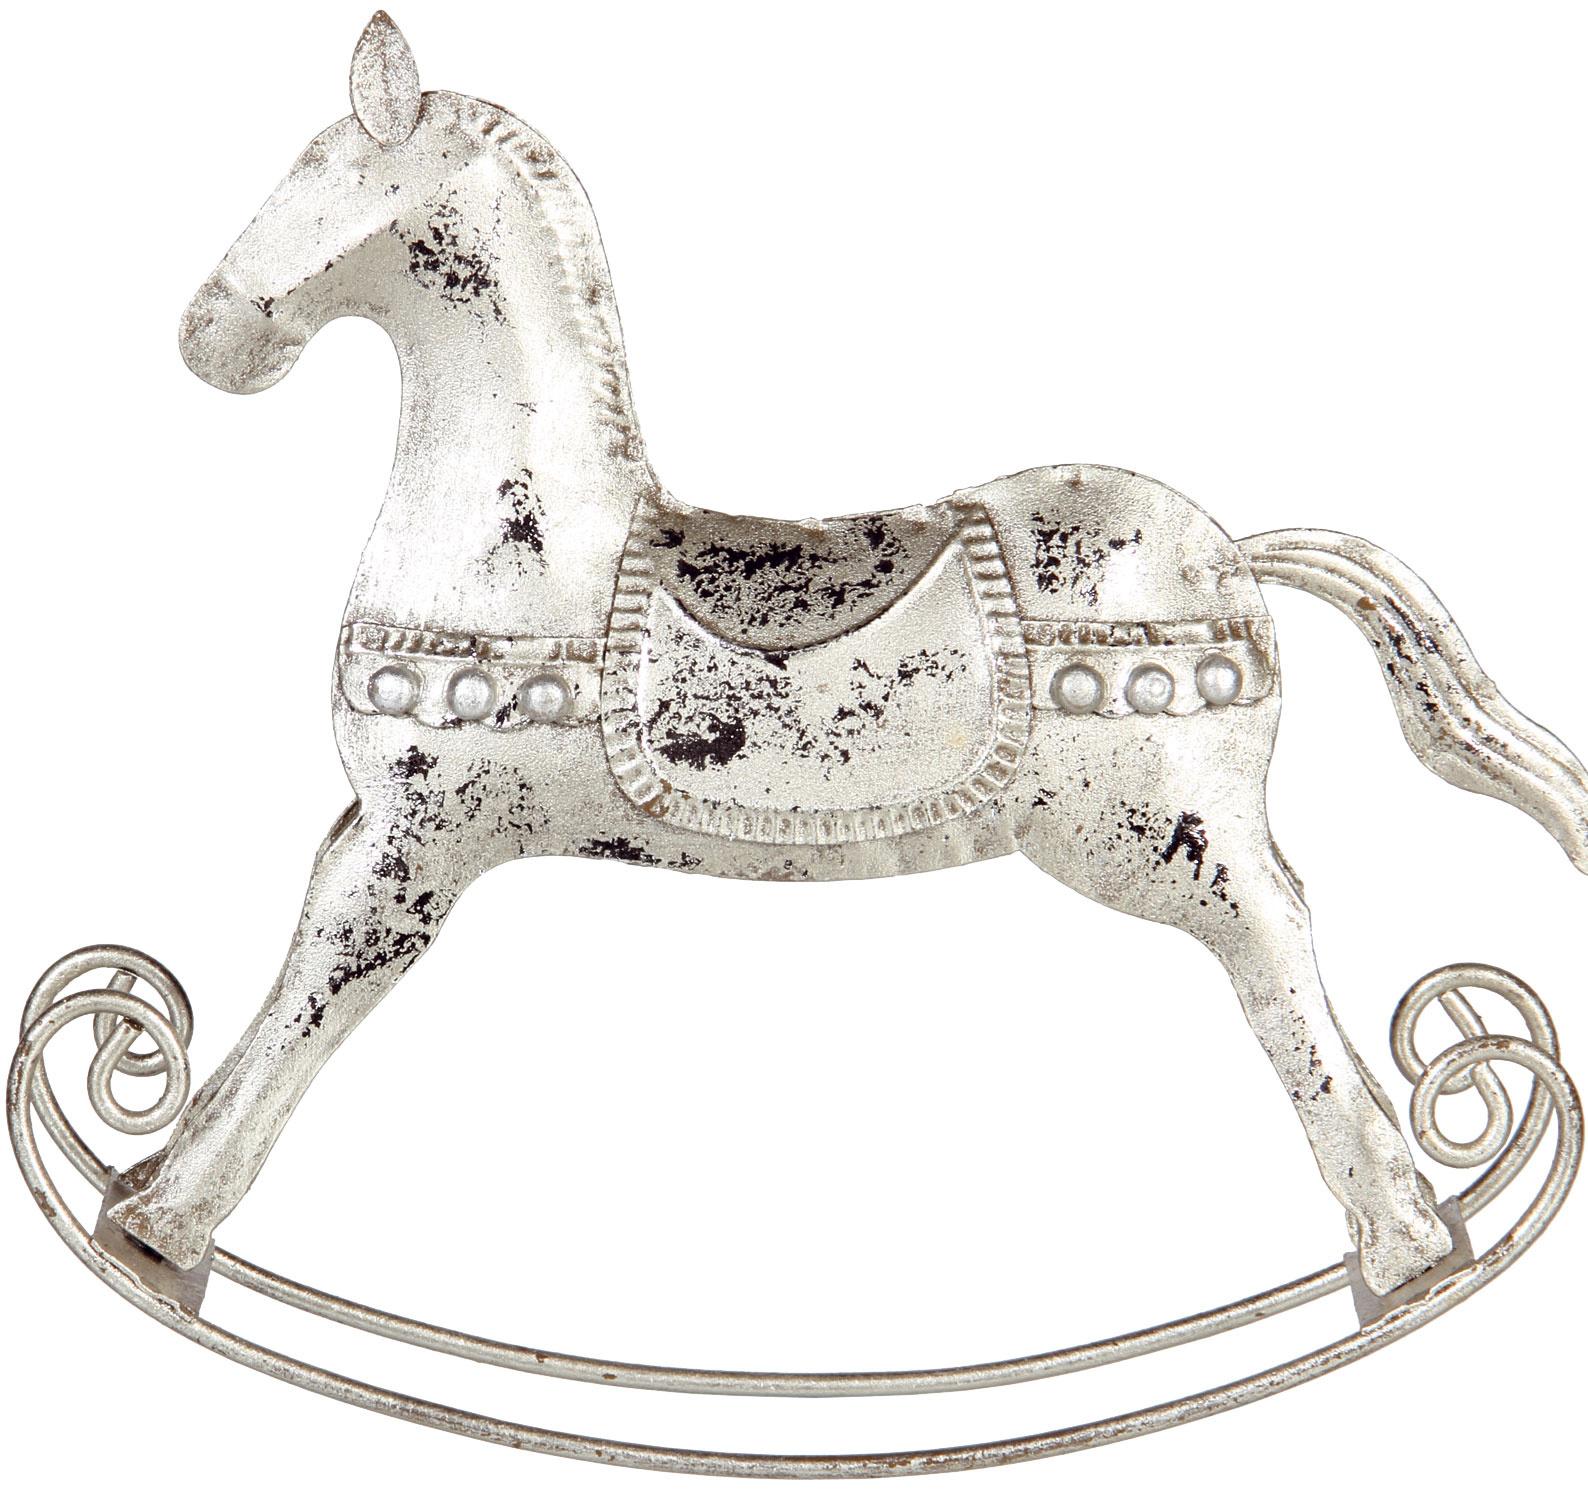 Dekoratívny hojdací koník, 8,38 €, www.bellarose.sk